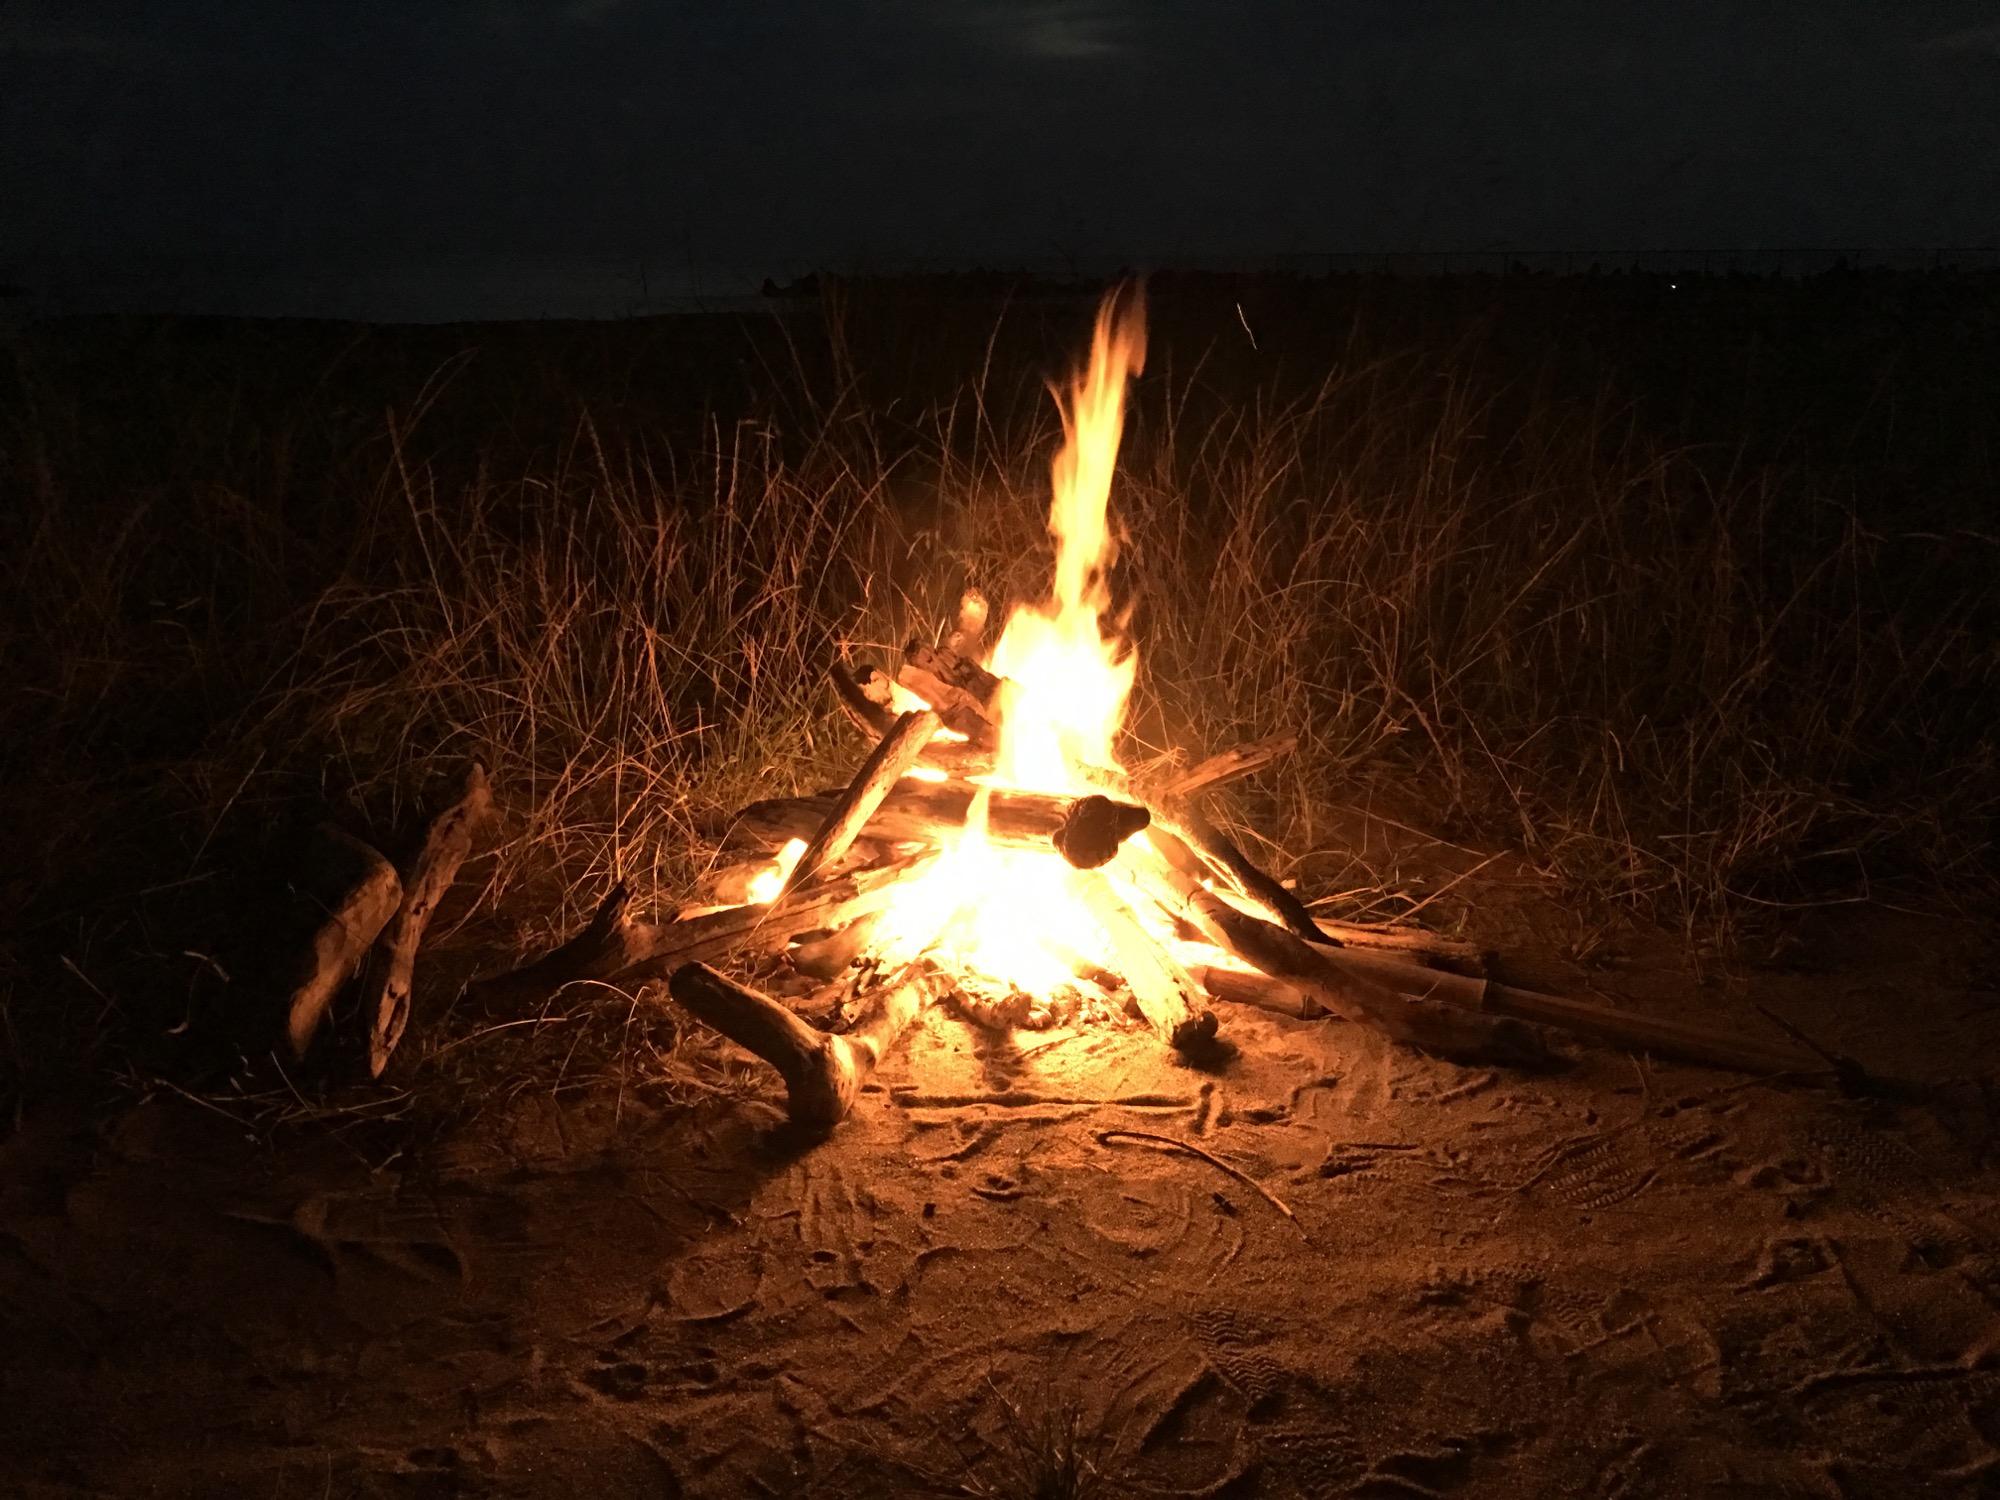 Our Suruga Bay-side campfire.